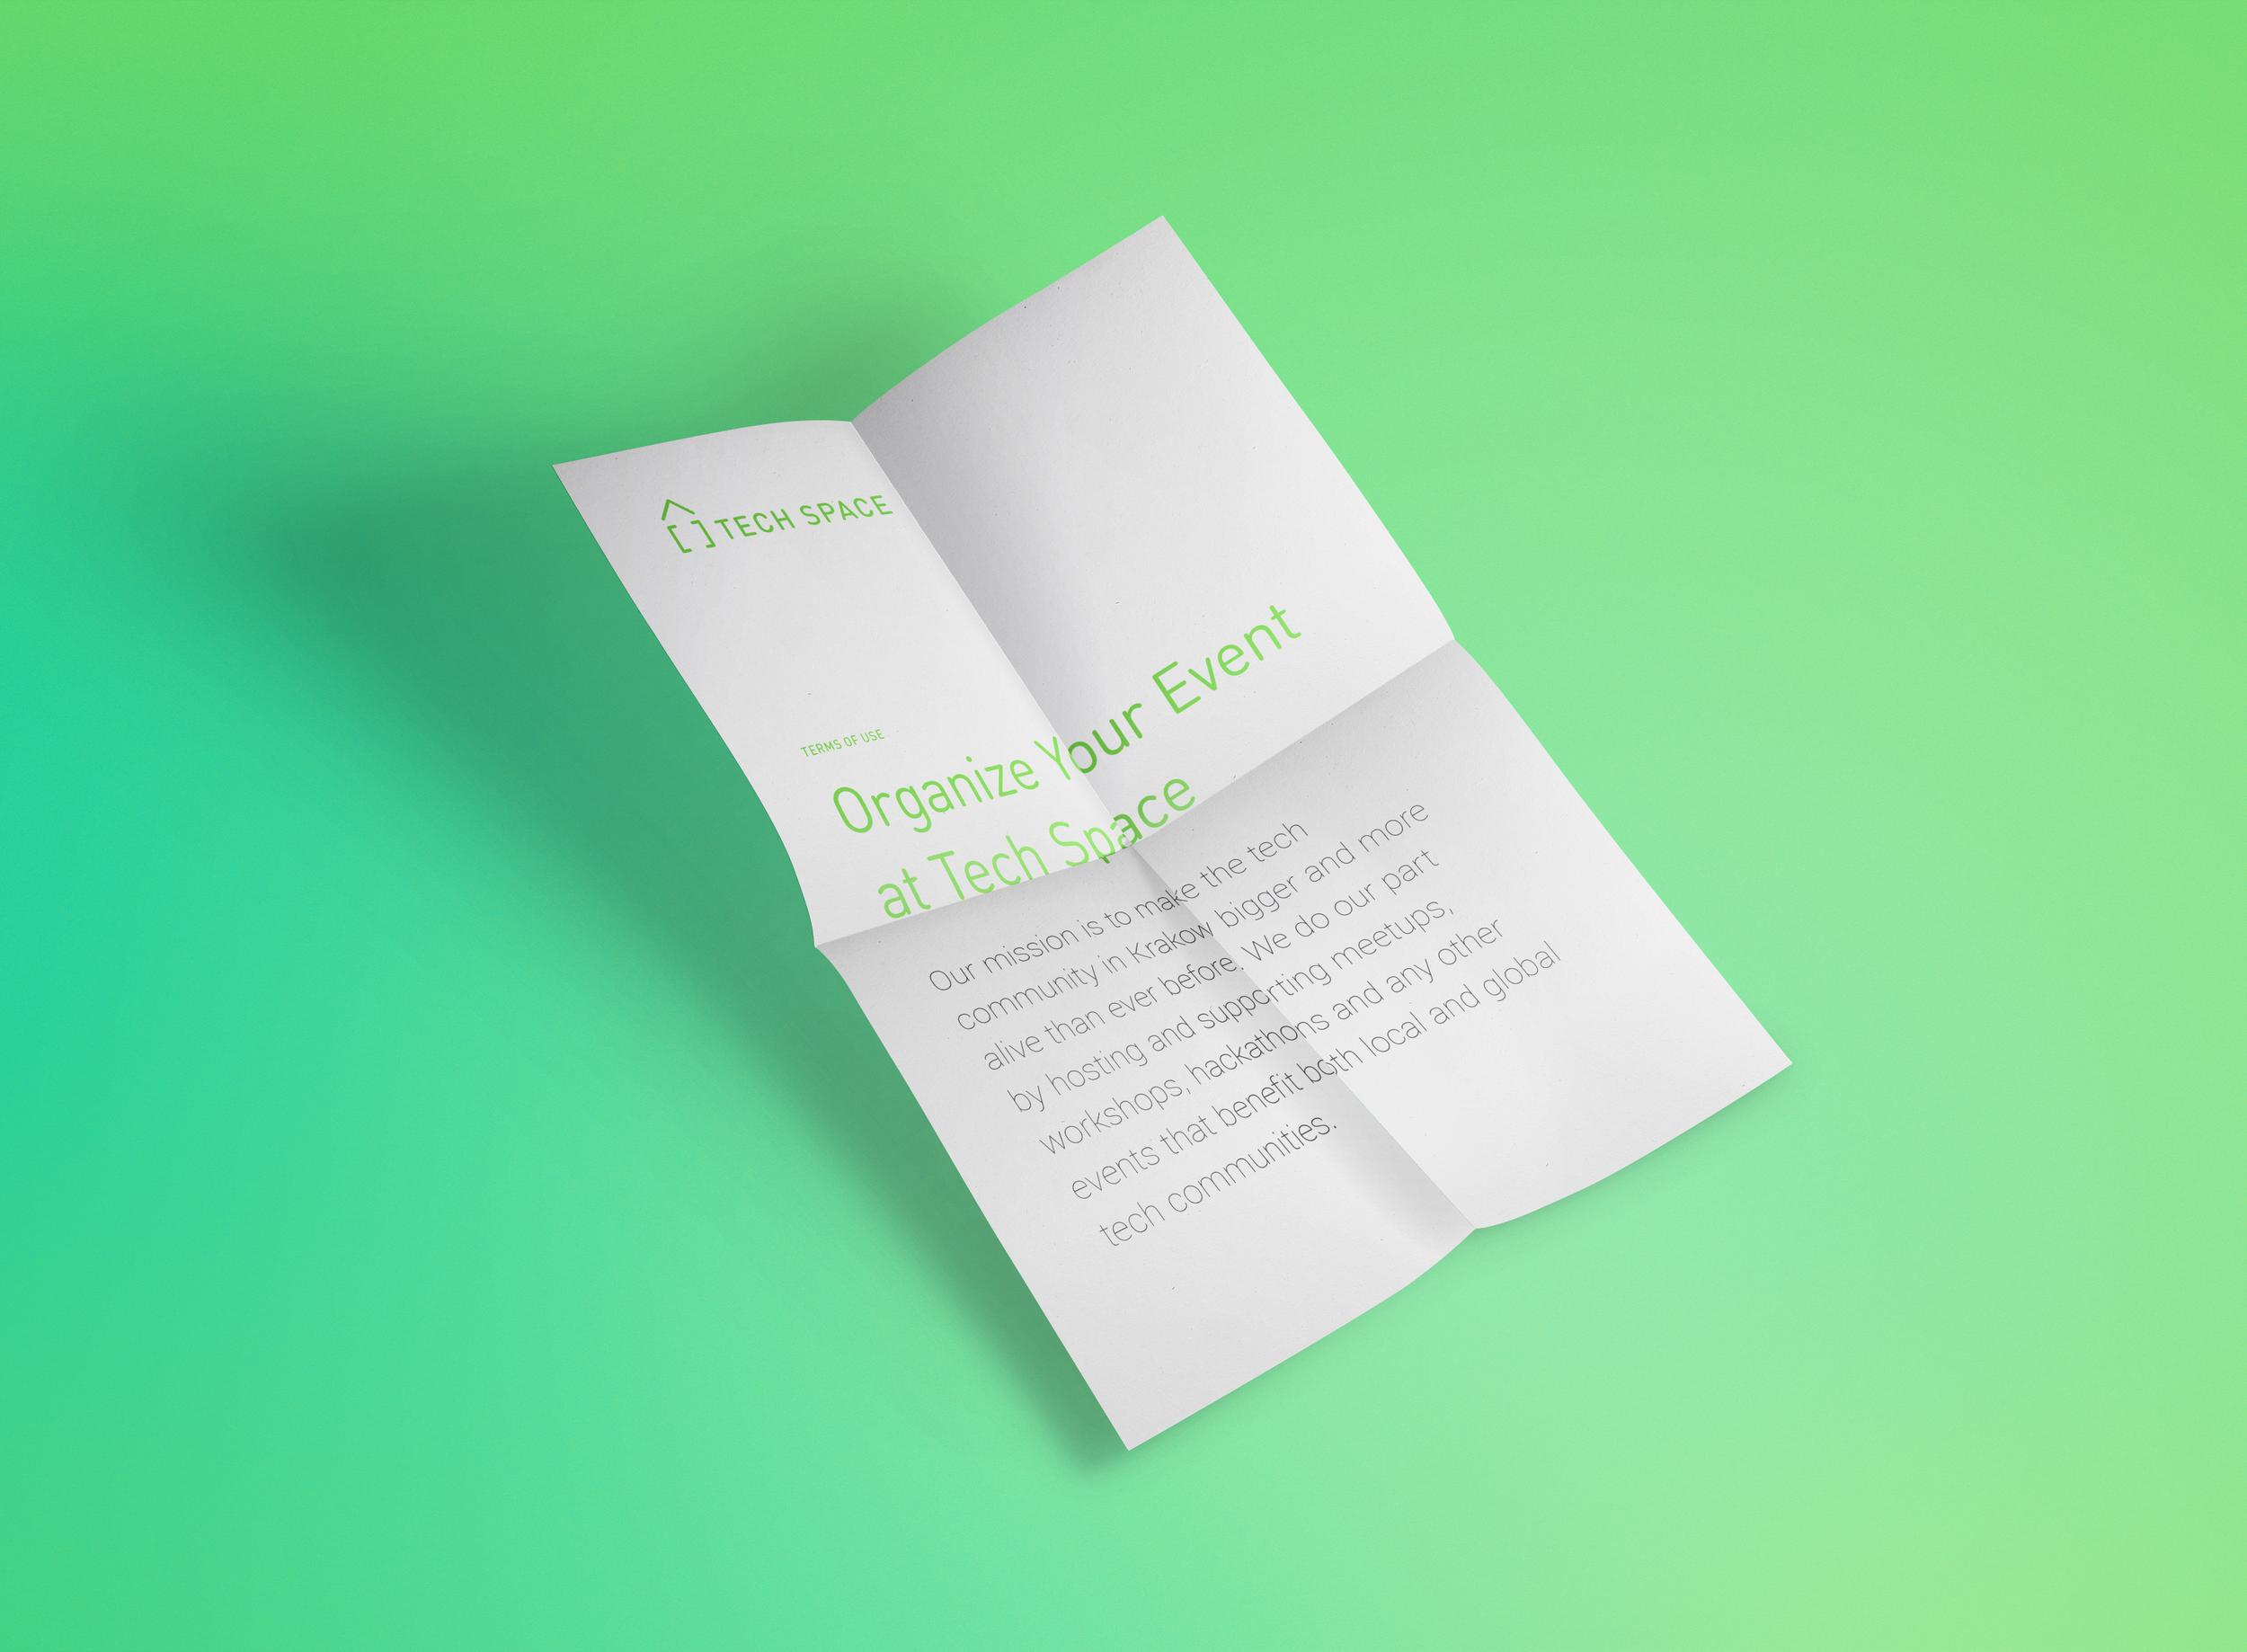 techspace_letterhead.png